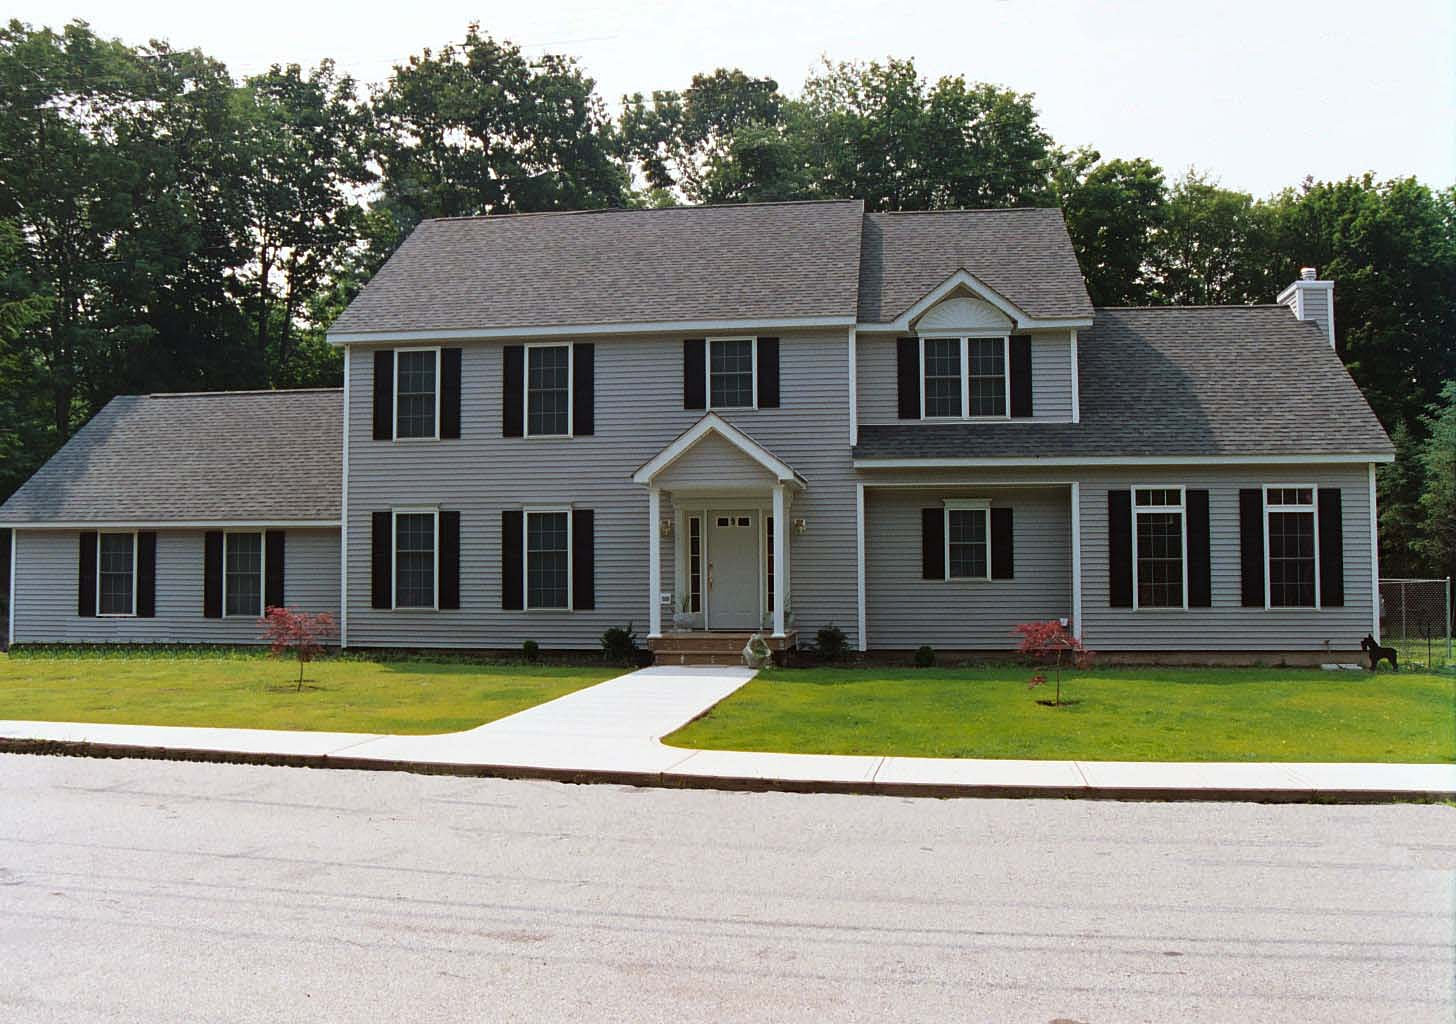 Two Story Homes Butler Homes Inc Modular Homes Ny Custom Homes Ny